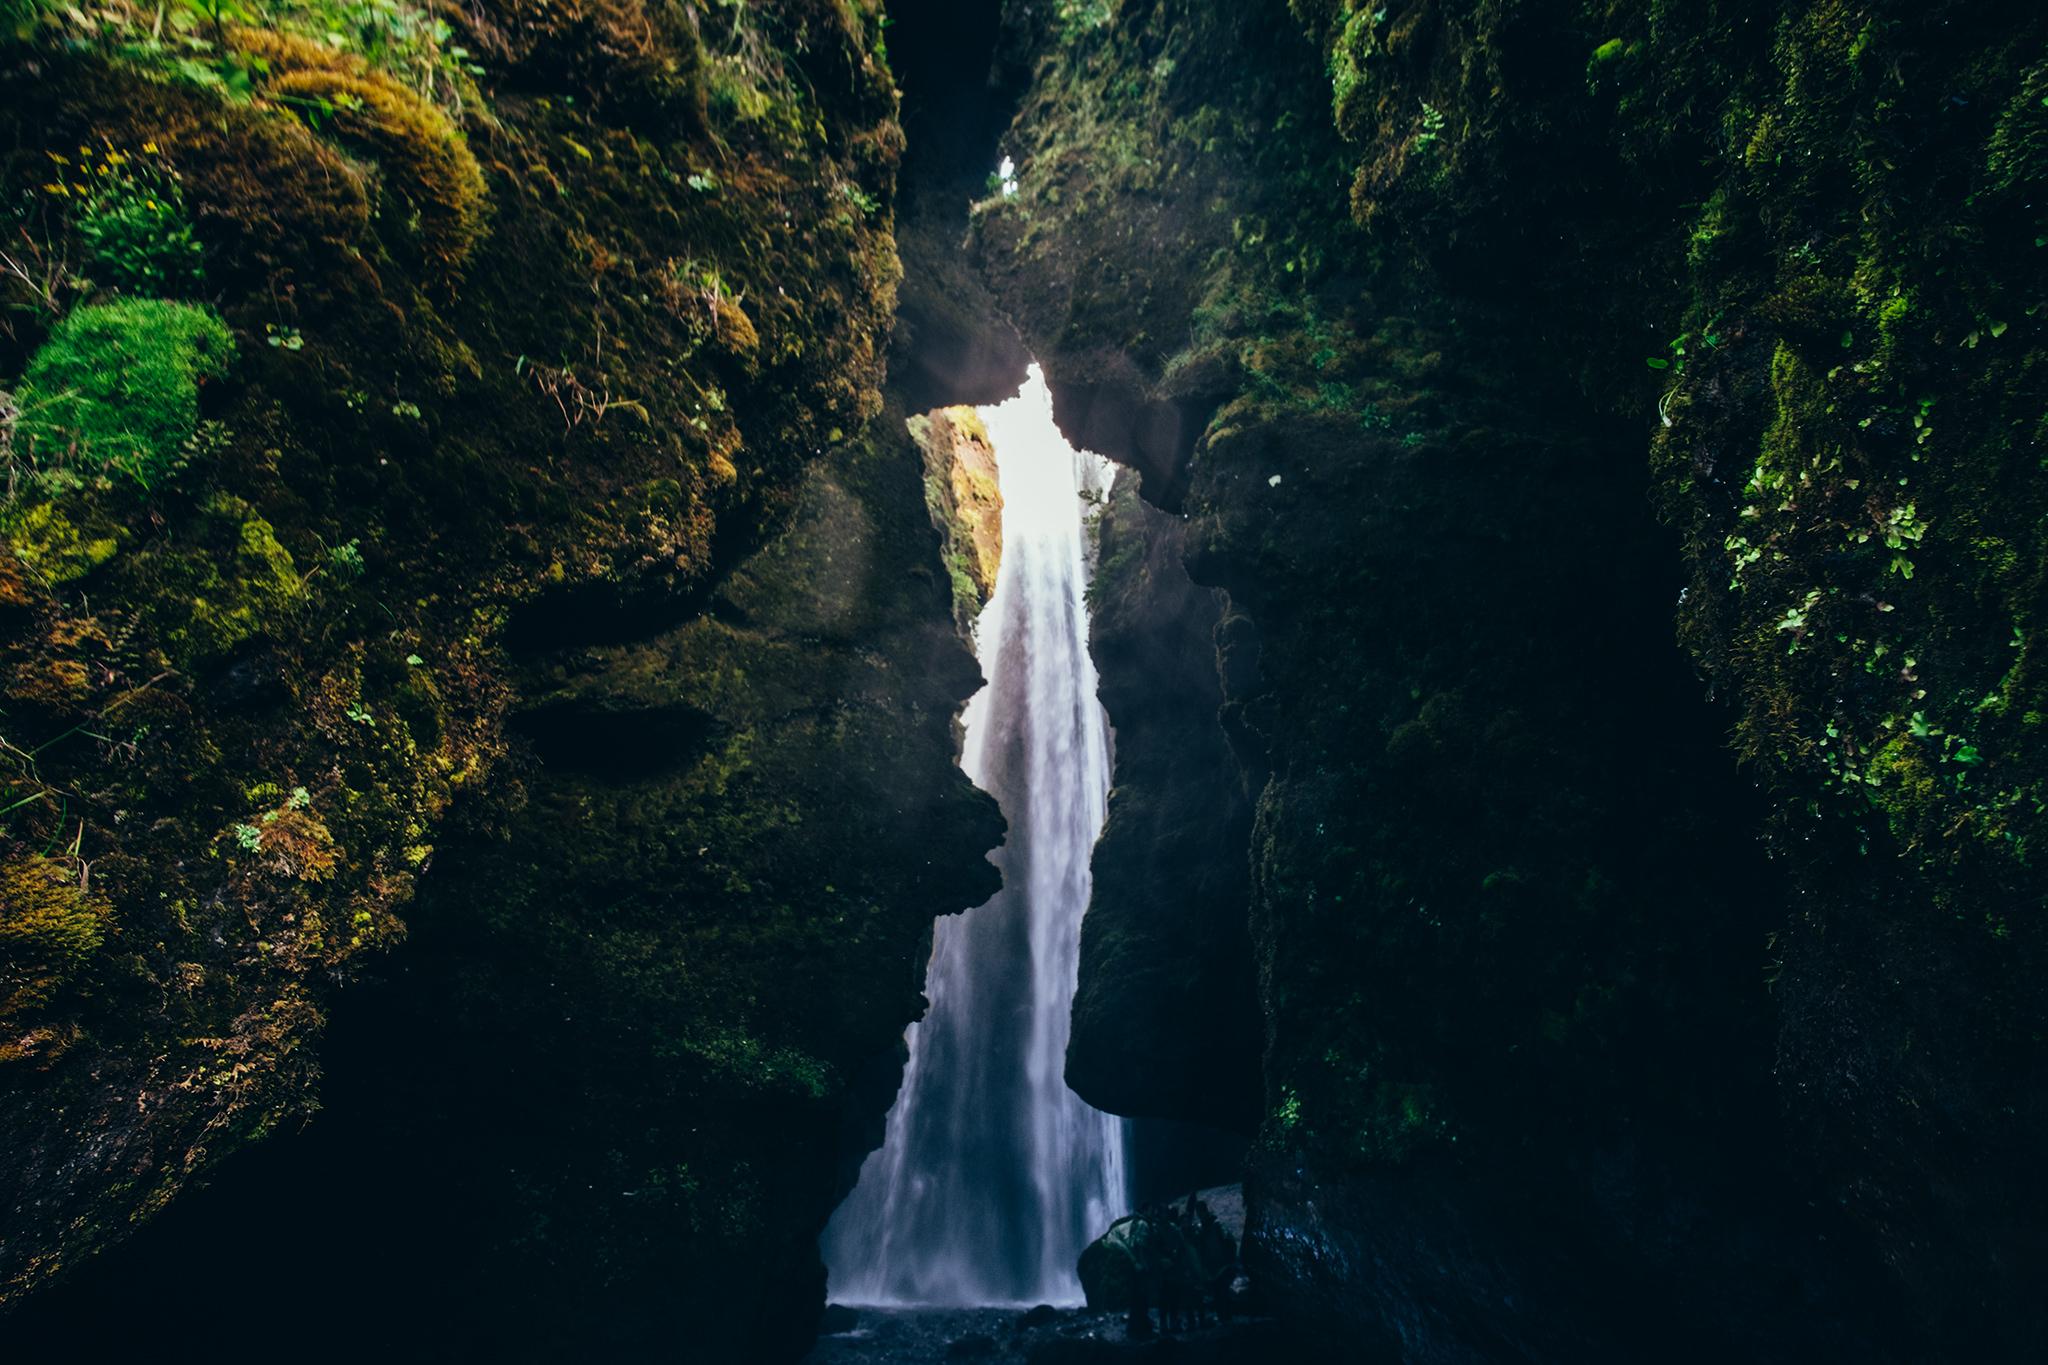 Gljúfrabúi Gorge